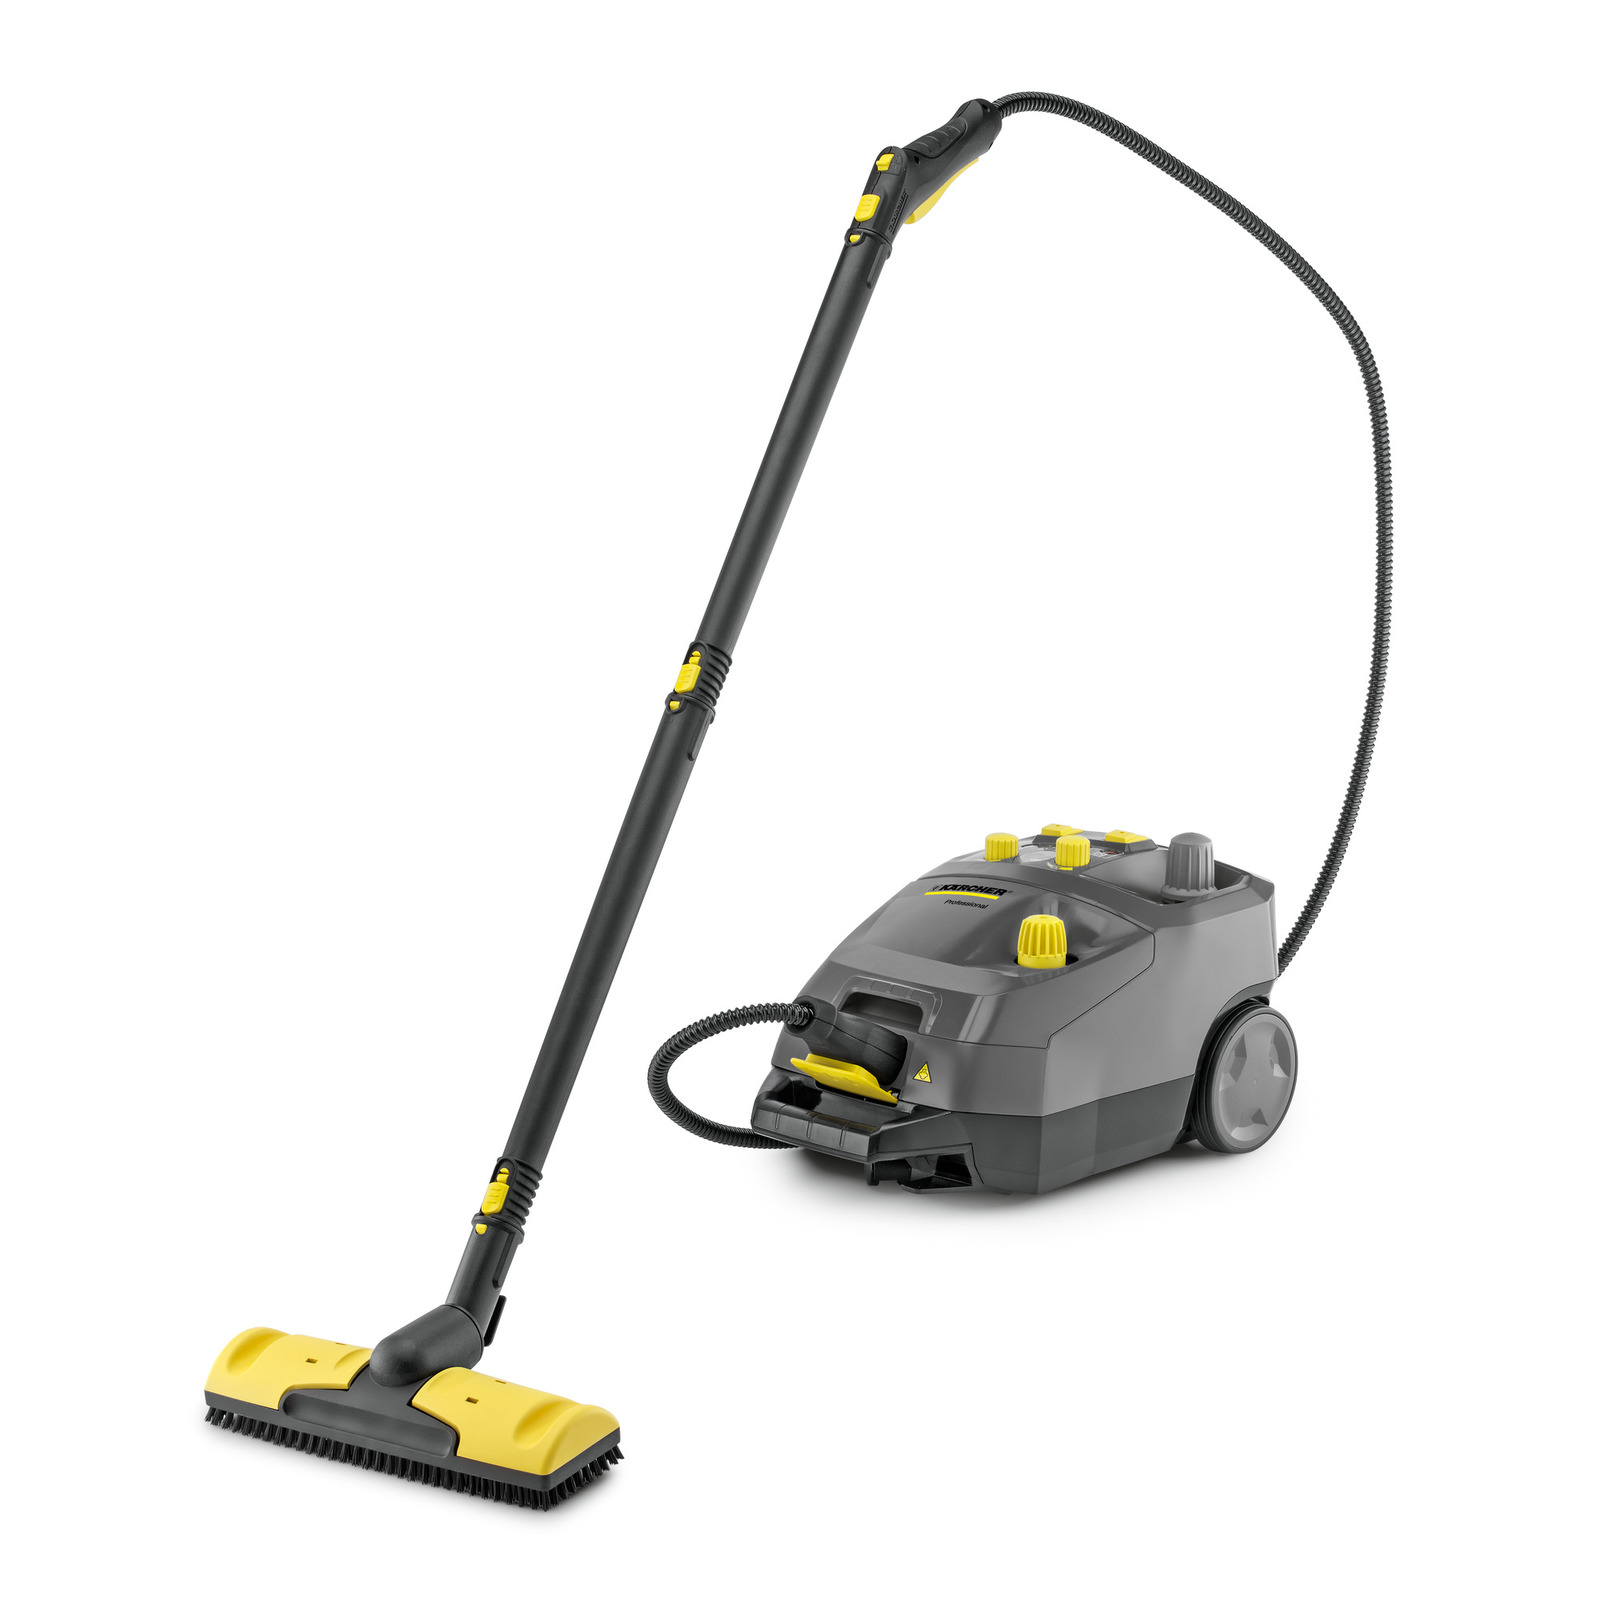 Commercial Steam Cleaner SG Kärcher - Cheap floor steam cleaners